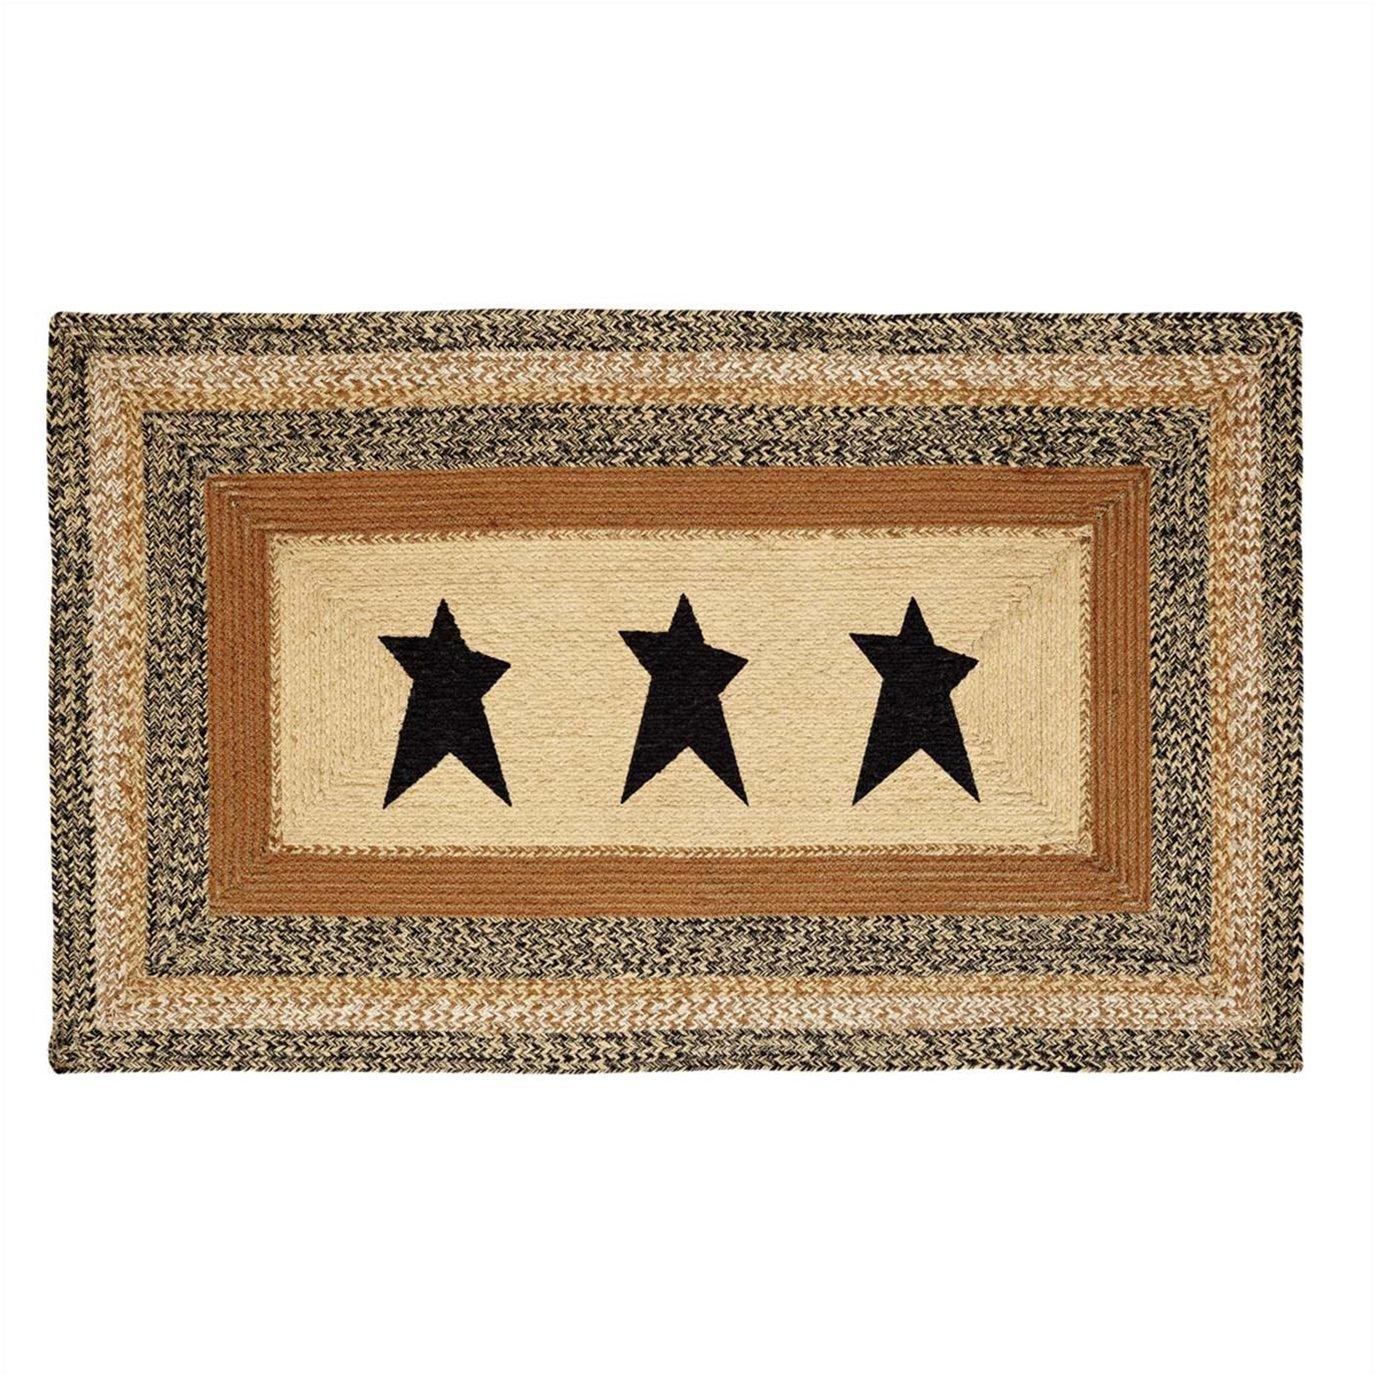 Kettle Grove Jute Rug Rectangular  Stencil Star 36x60